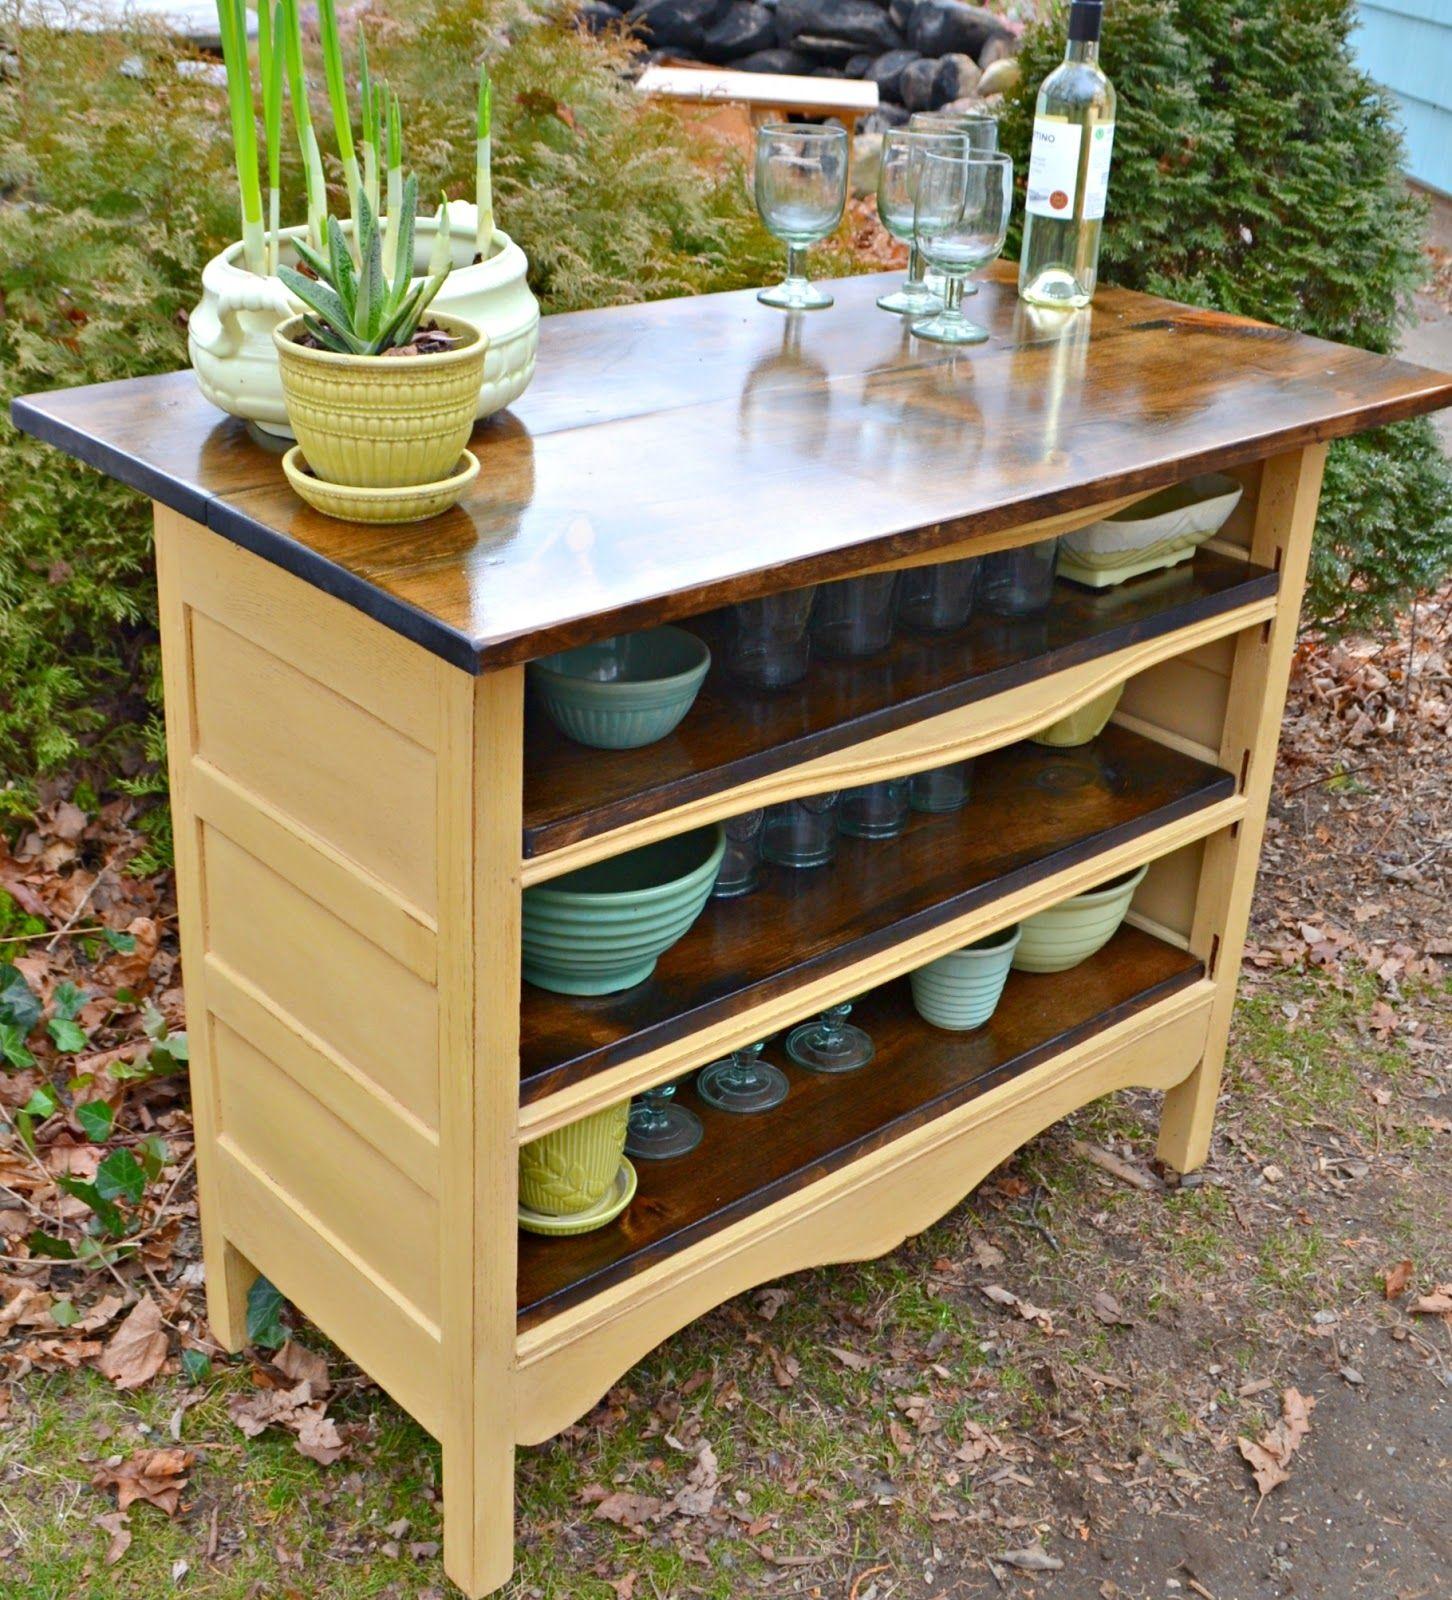 An antique dresser turned kitchen island repurposed